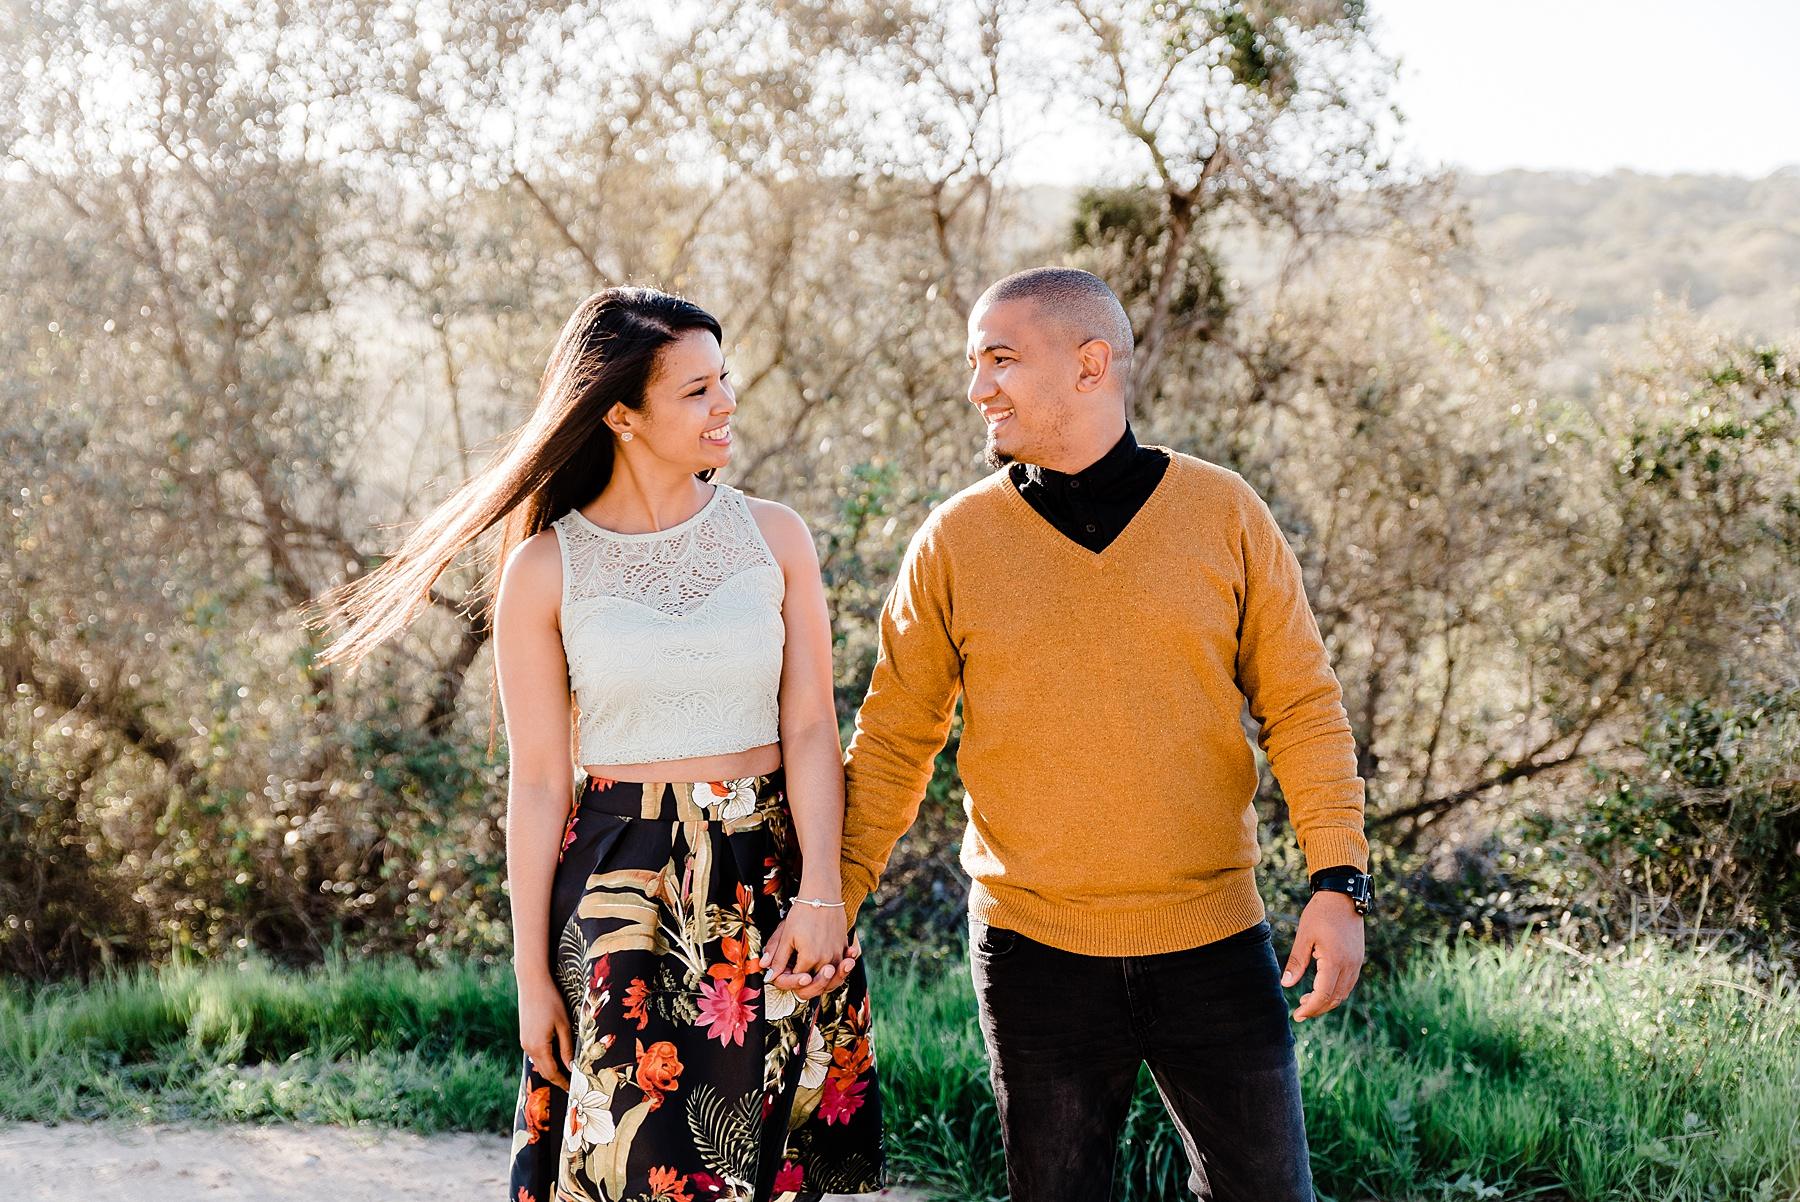 Shanel & Edwill | Engagement